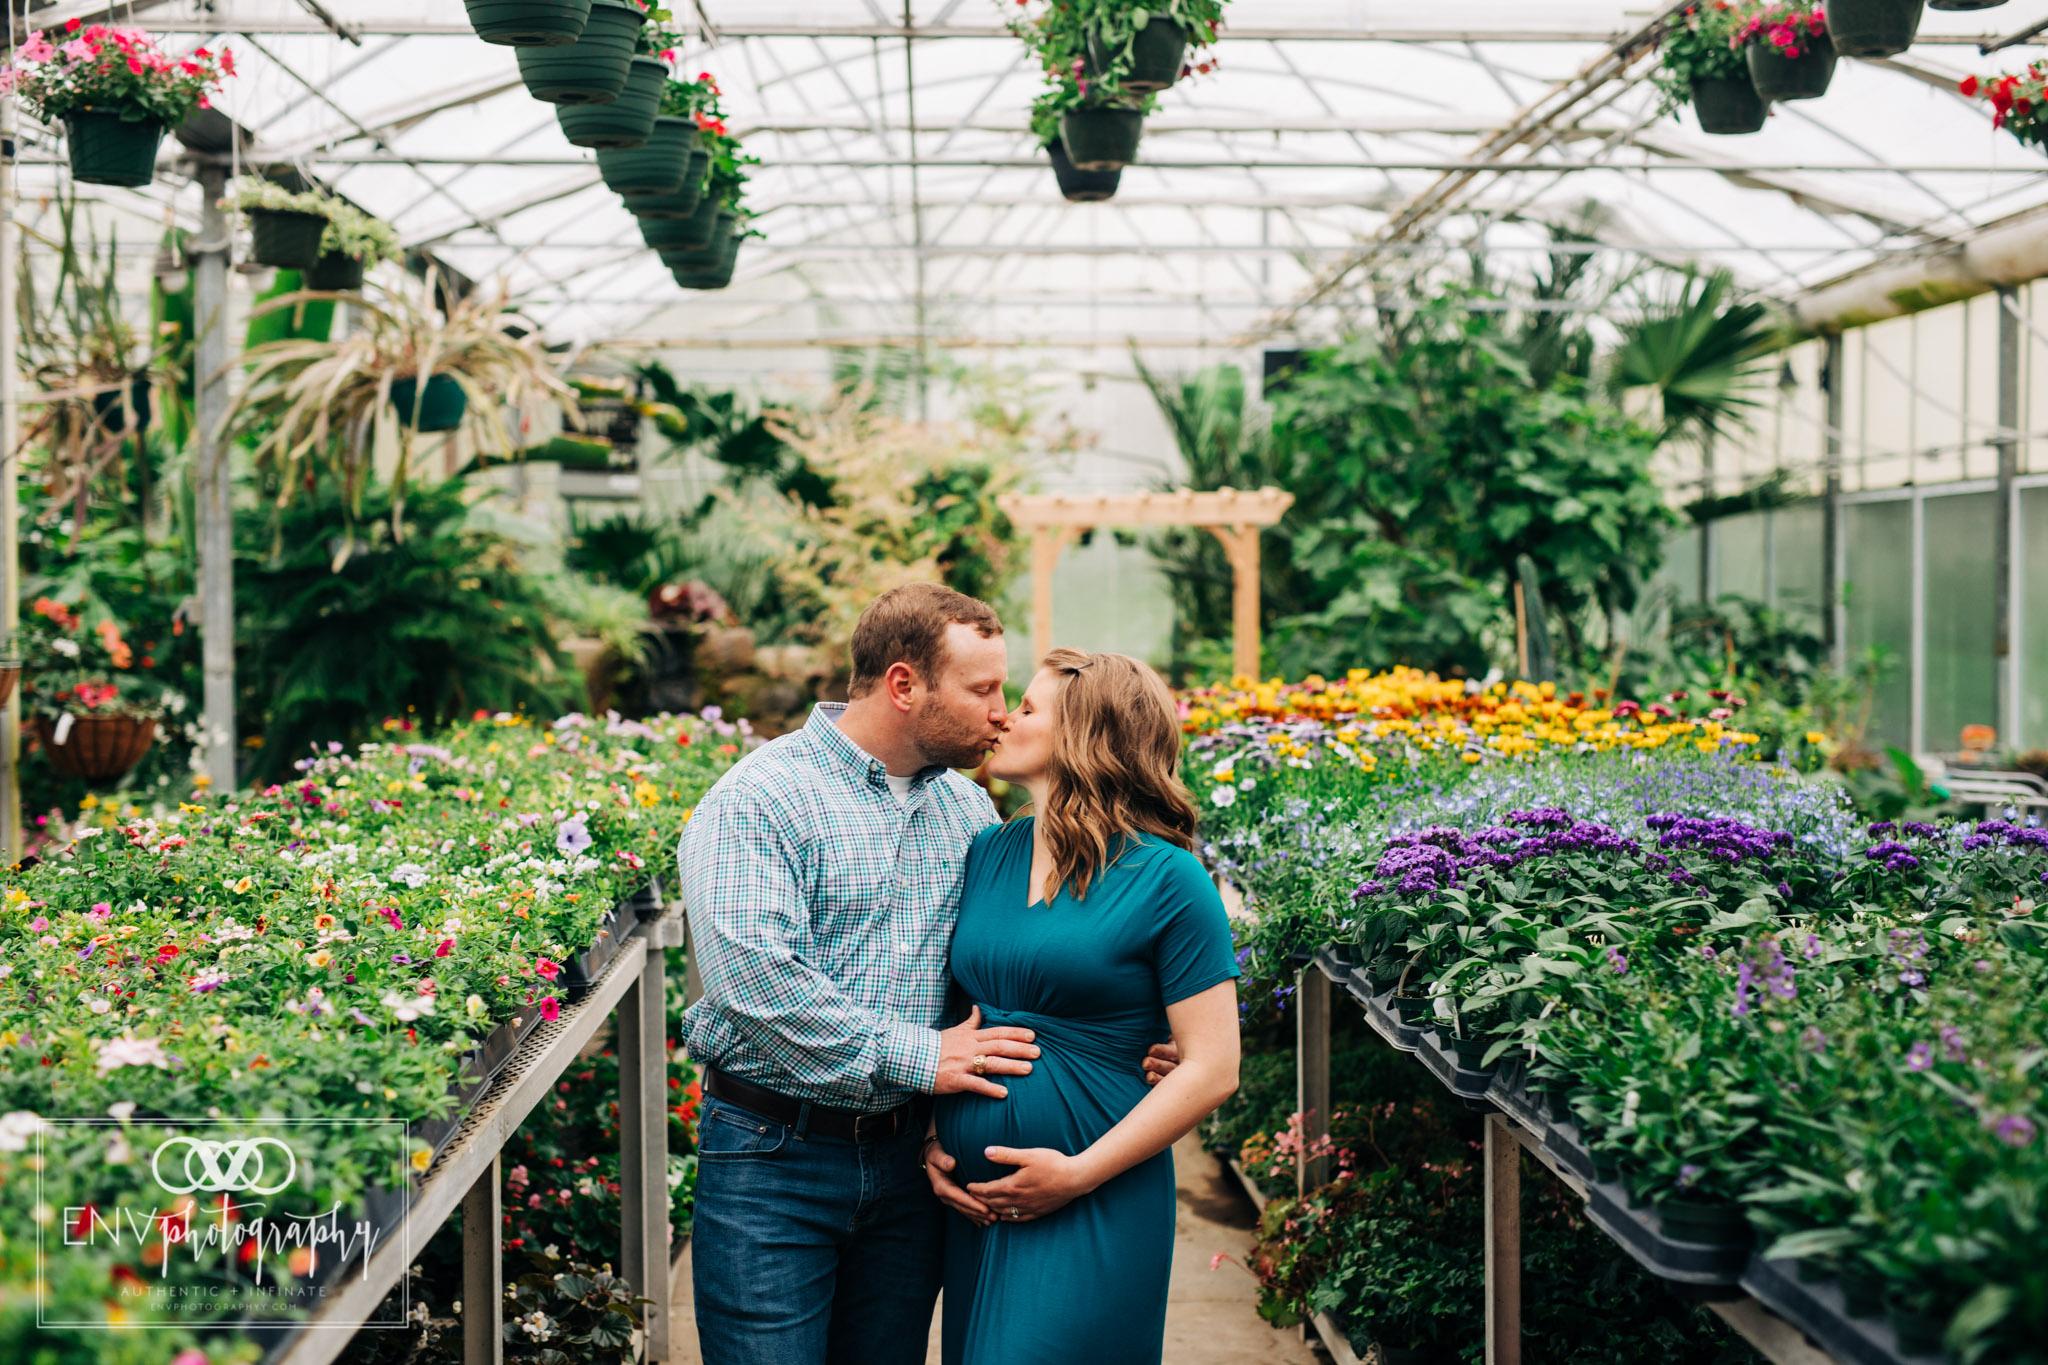 mount vernon columbus mansfield ohio maternity newborn photographer mohican gardens (6).jpg